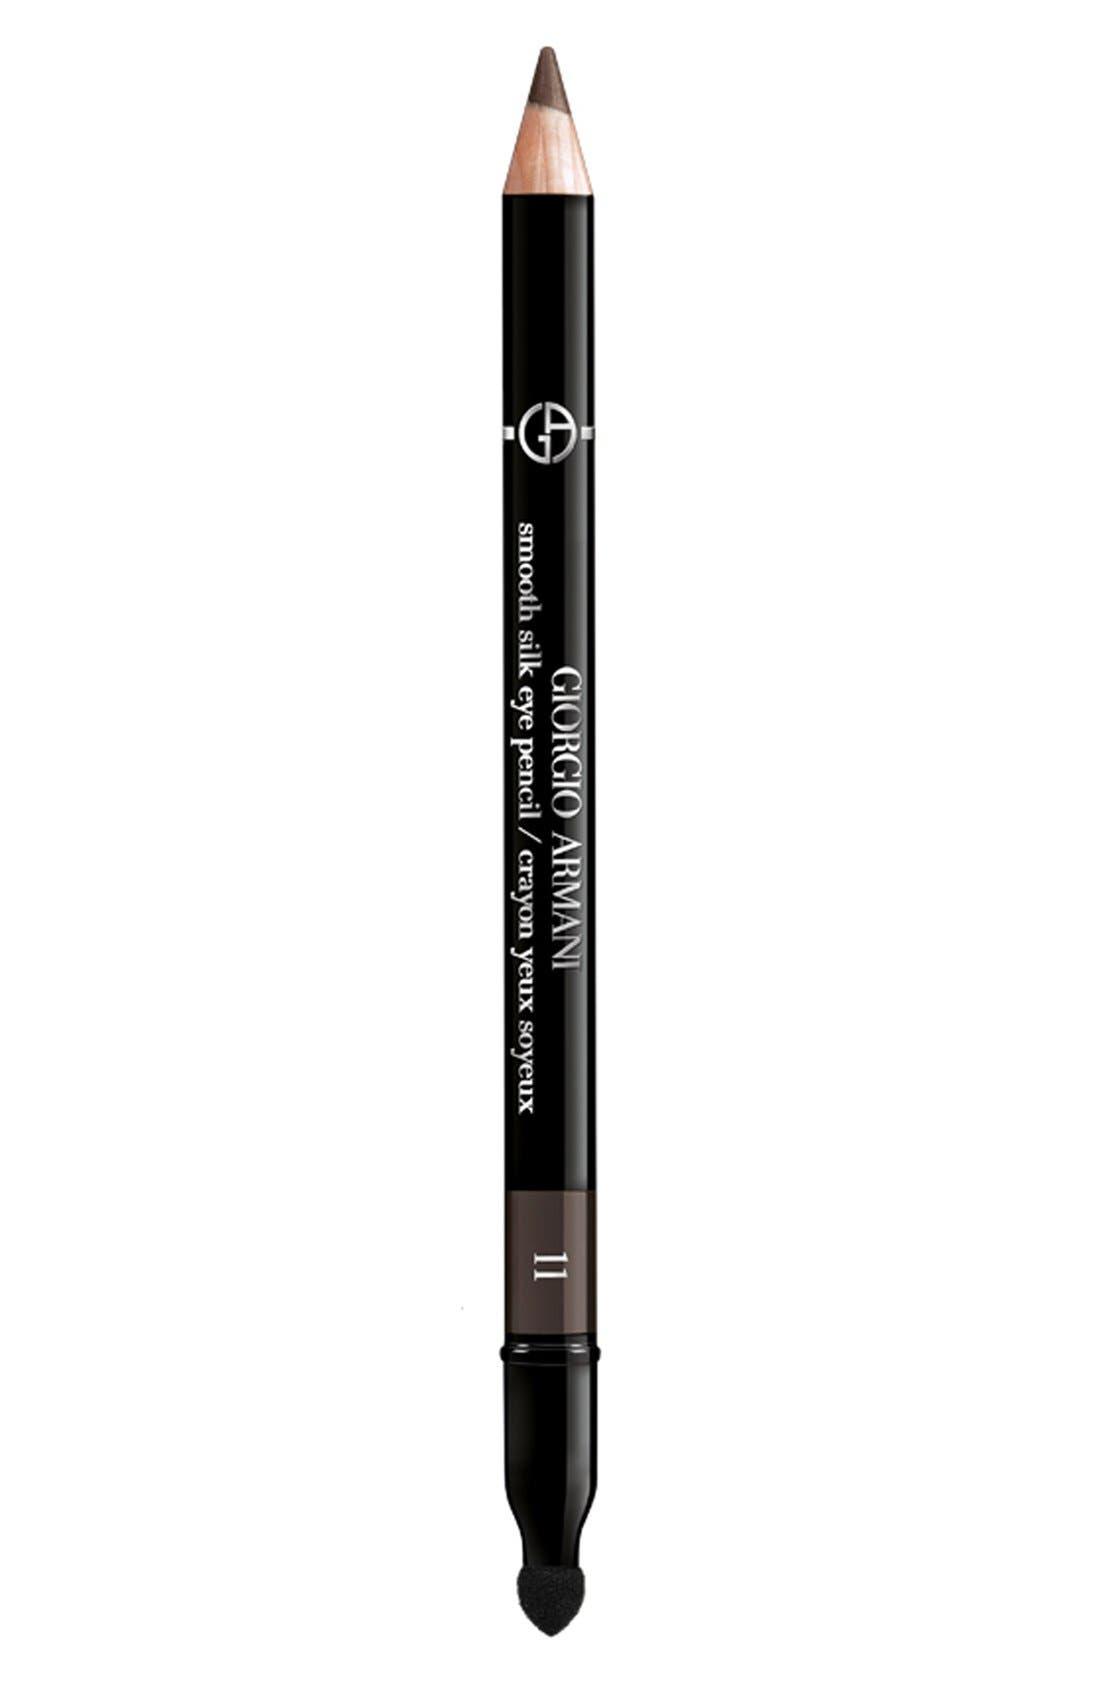 'Smooth Silk' Eye Pencil,                             Main thumbnail 1, color,                             11